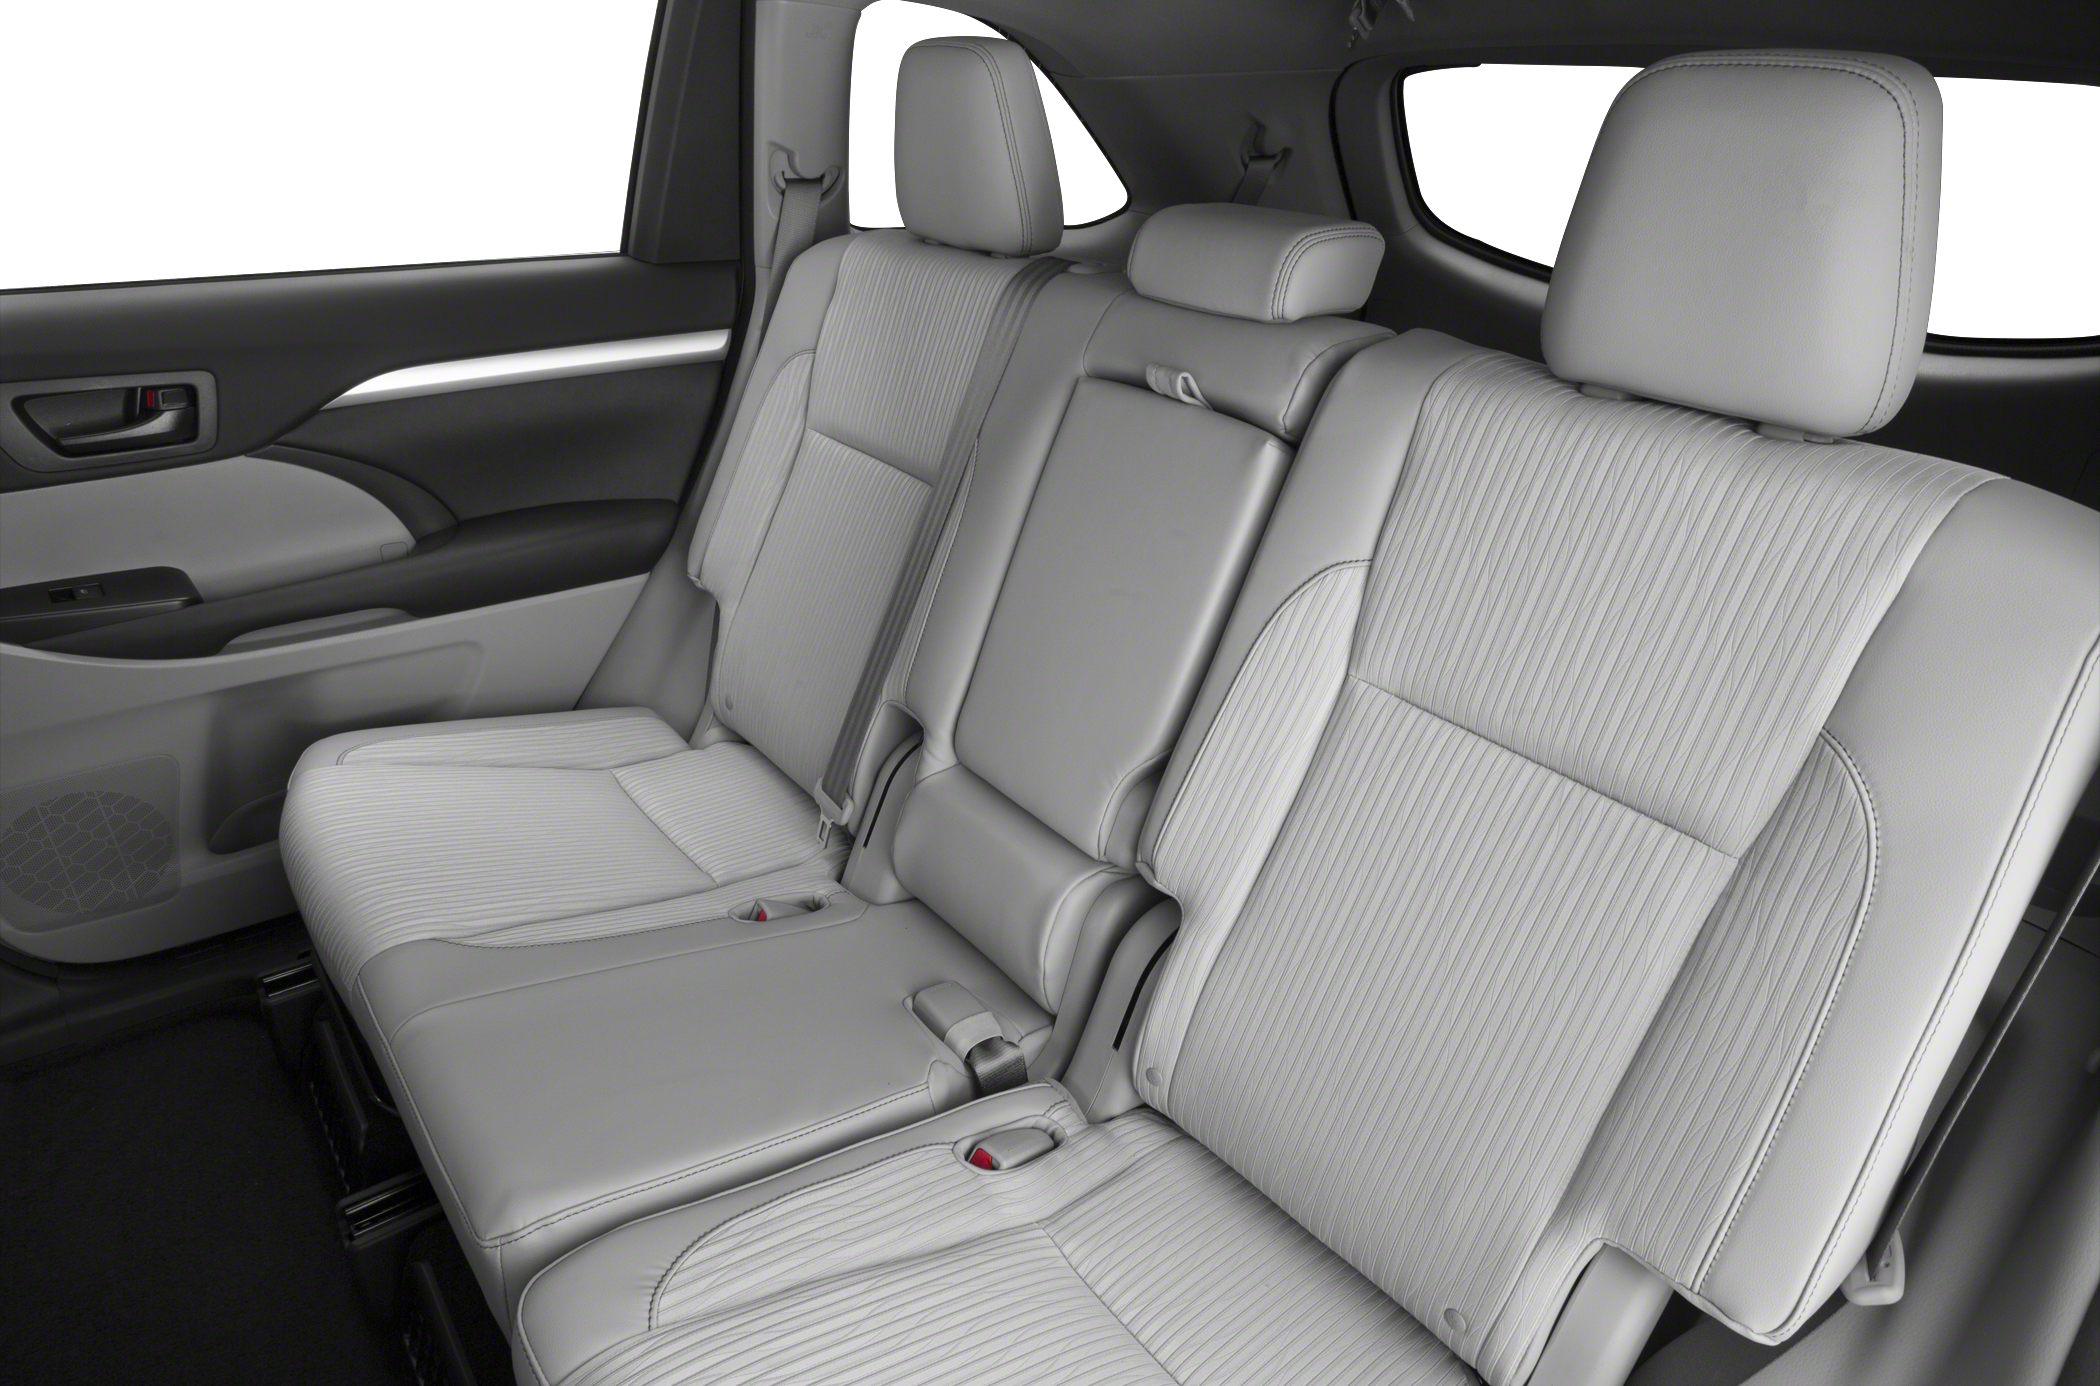 2016 toyota highlander hybrid styles features highlights. Black Bedroom Furniture Sets. Home Design Ideas